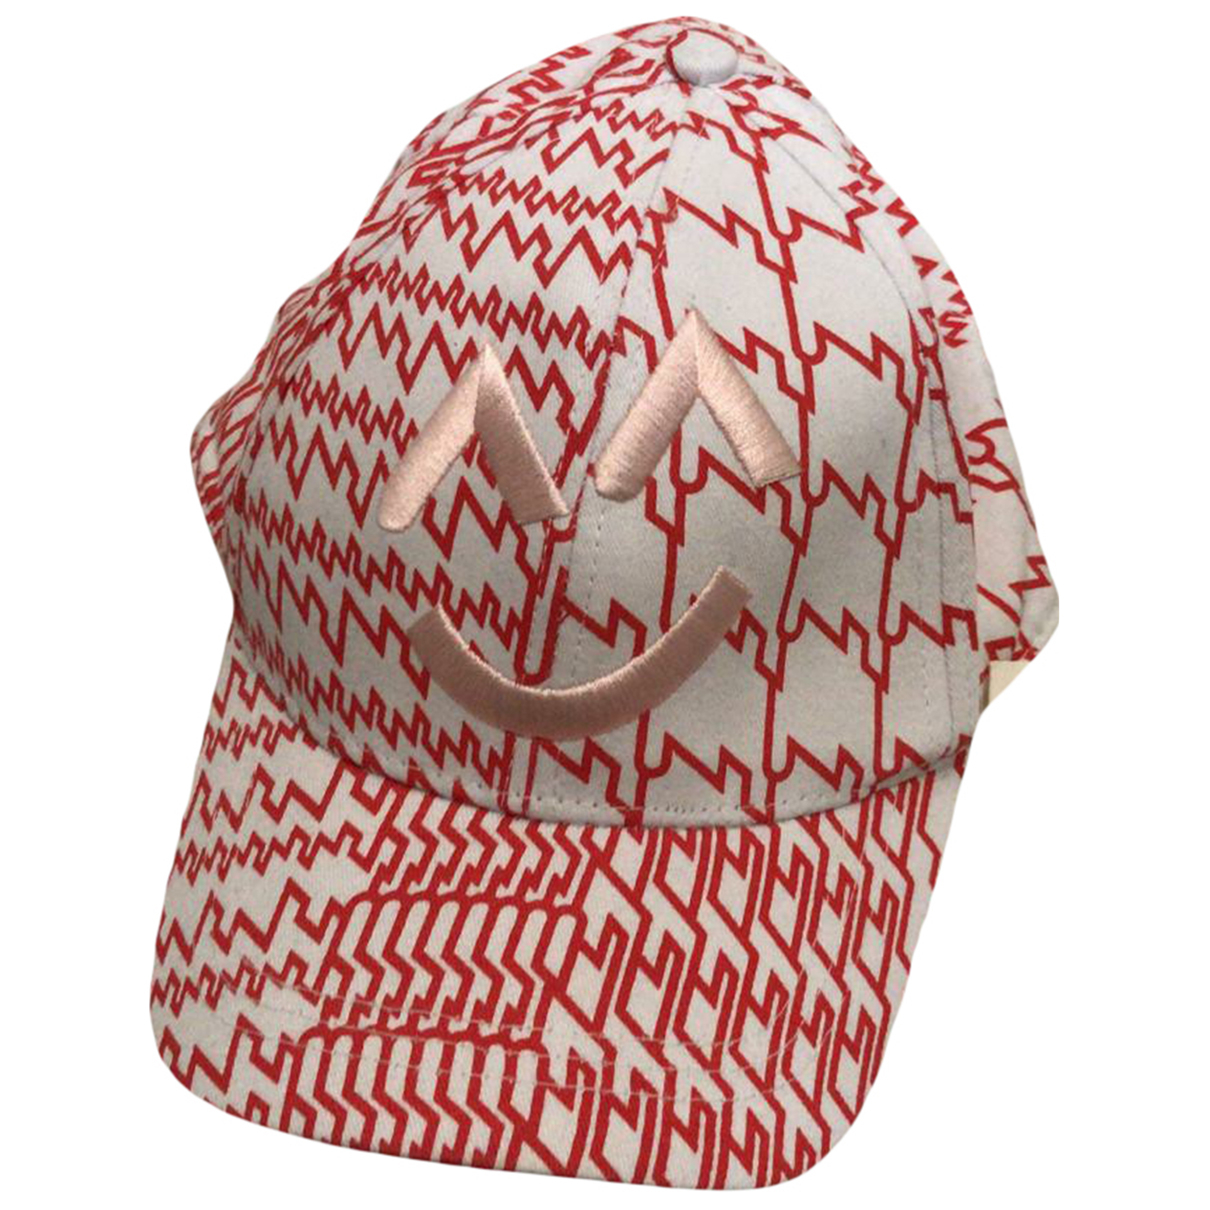 Kenzo \N Hut, Muetzen, Handschuhe in  Bunt Baumwolle